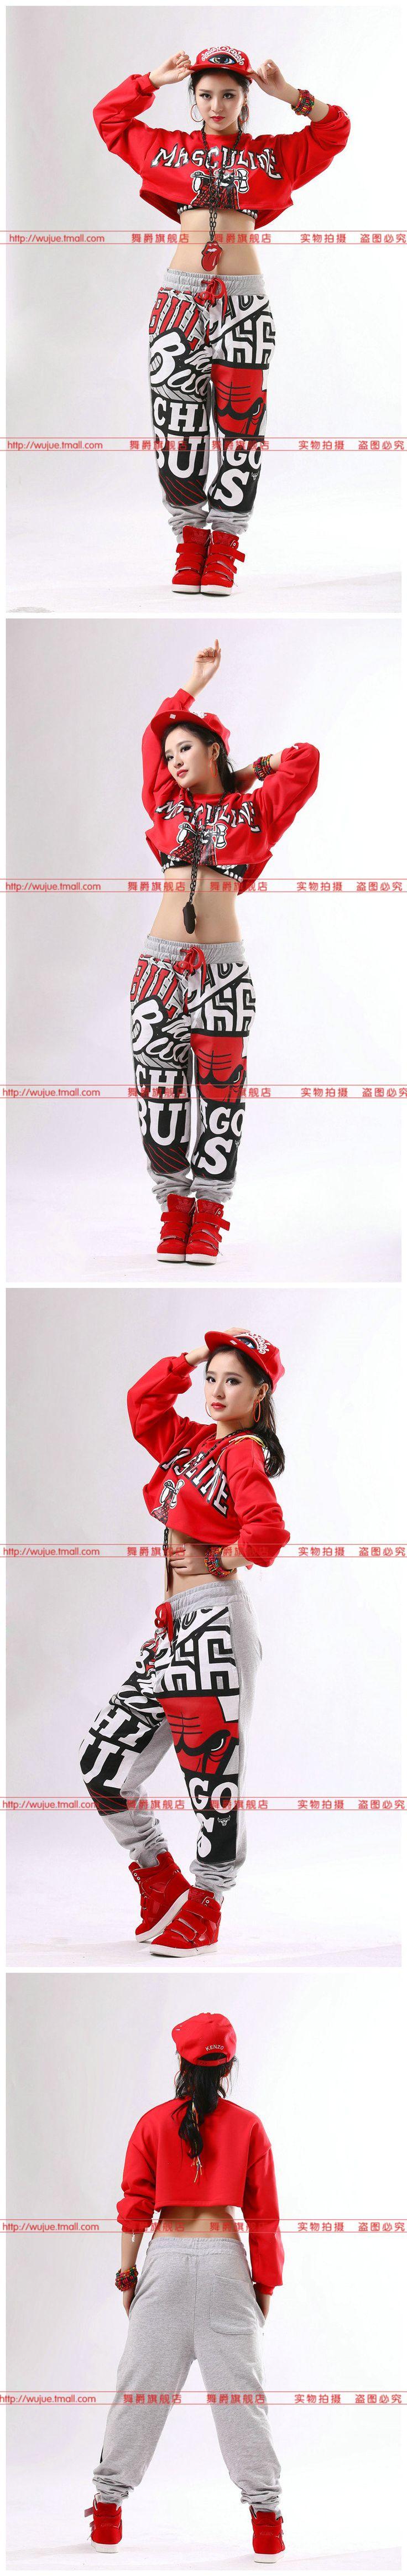 2016 New fashion Brand street skateboard Sweatpants Costumes female performance wear sports trousers Harem Hip Hop Dance Pants-inPants & Capris from Women's Clothing & Accessories on Aliexpress.com   Alibaba Group